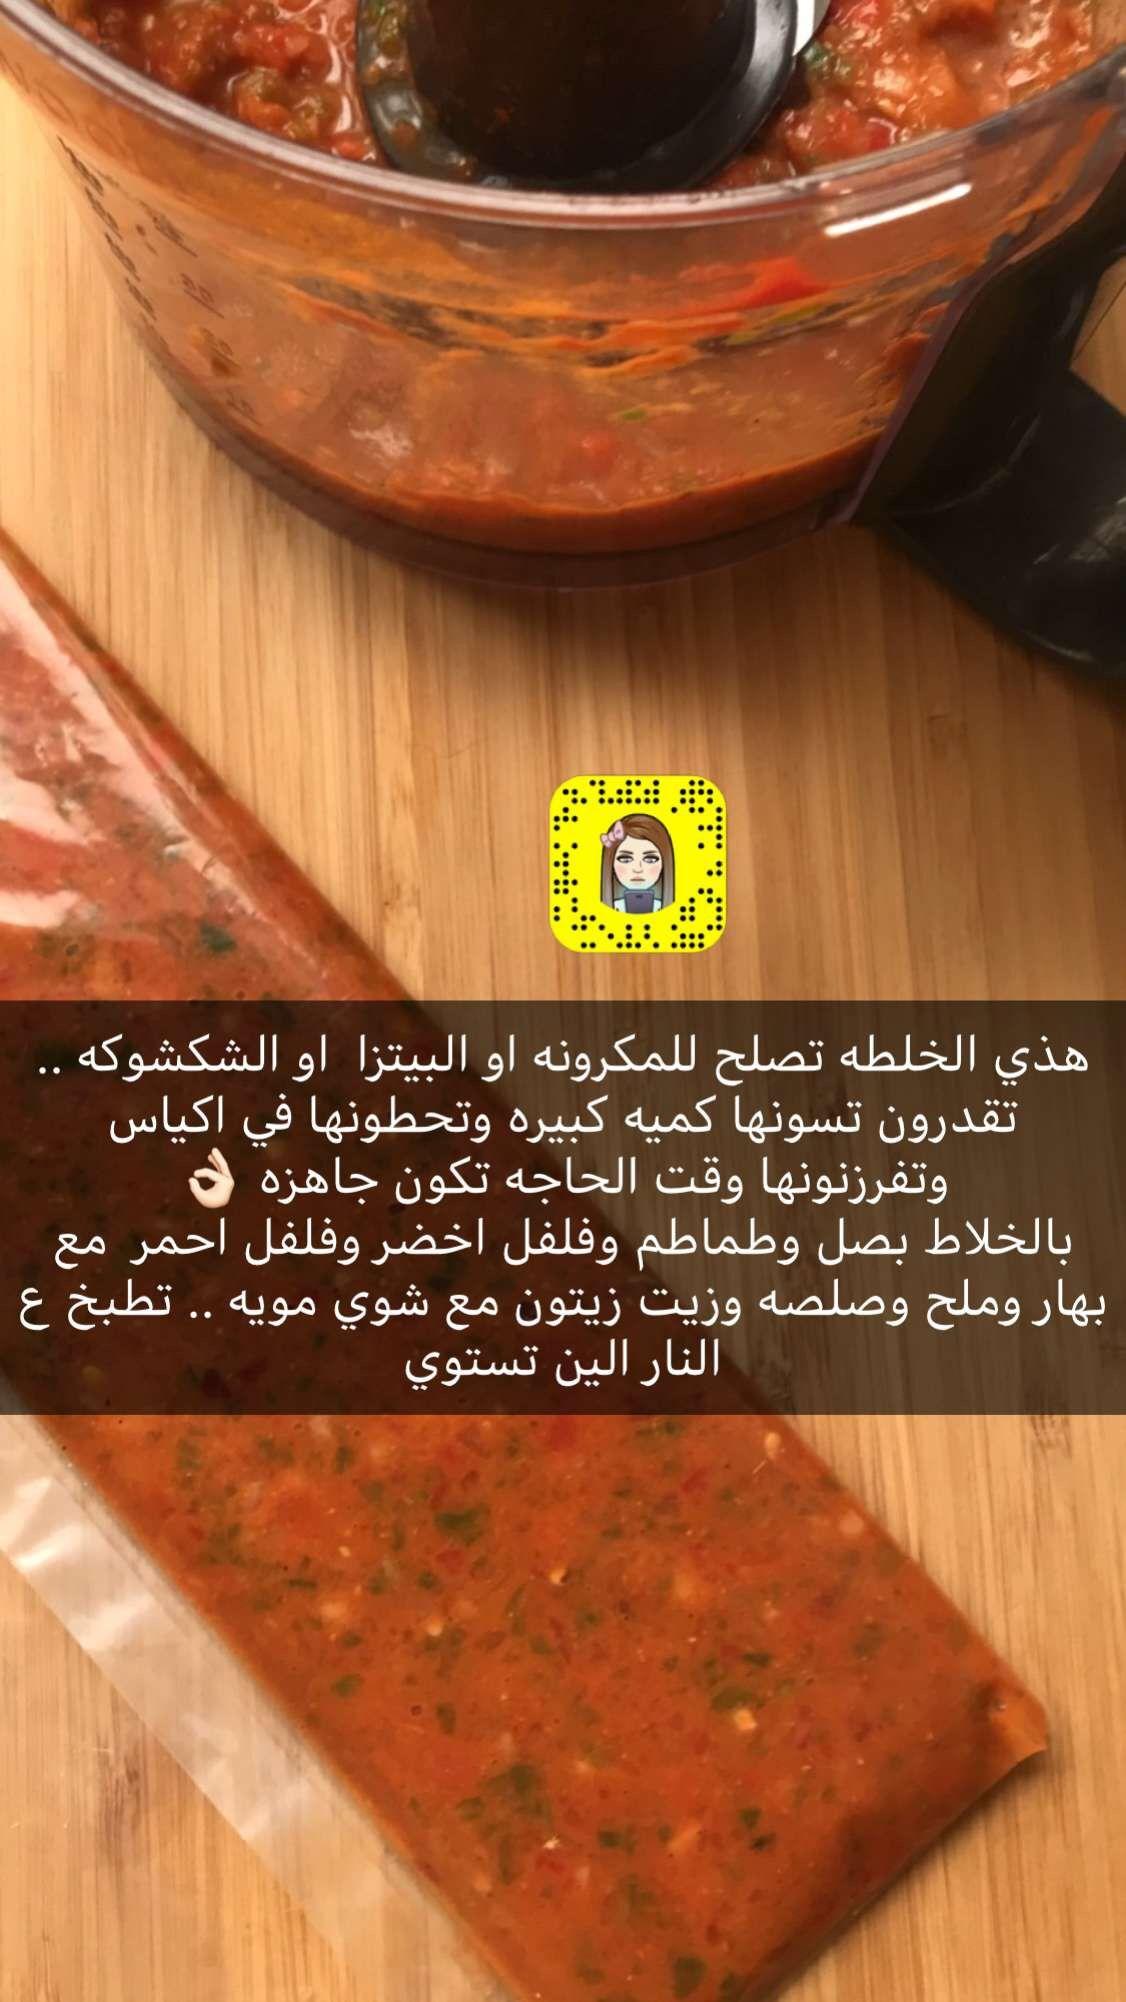 صلصة للمكرونه والبيتزا سهله Cookout Food Food Dishes Food Receipes